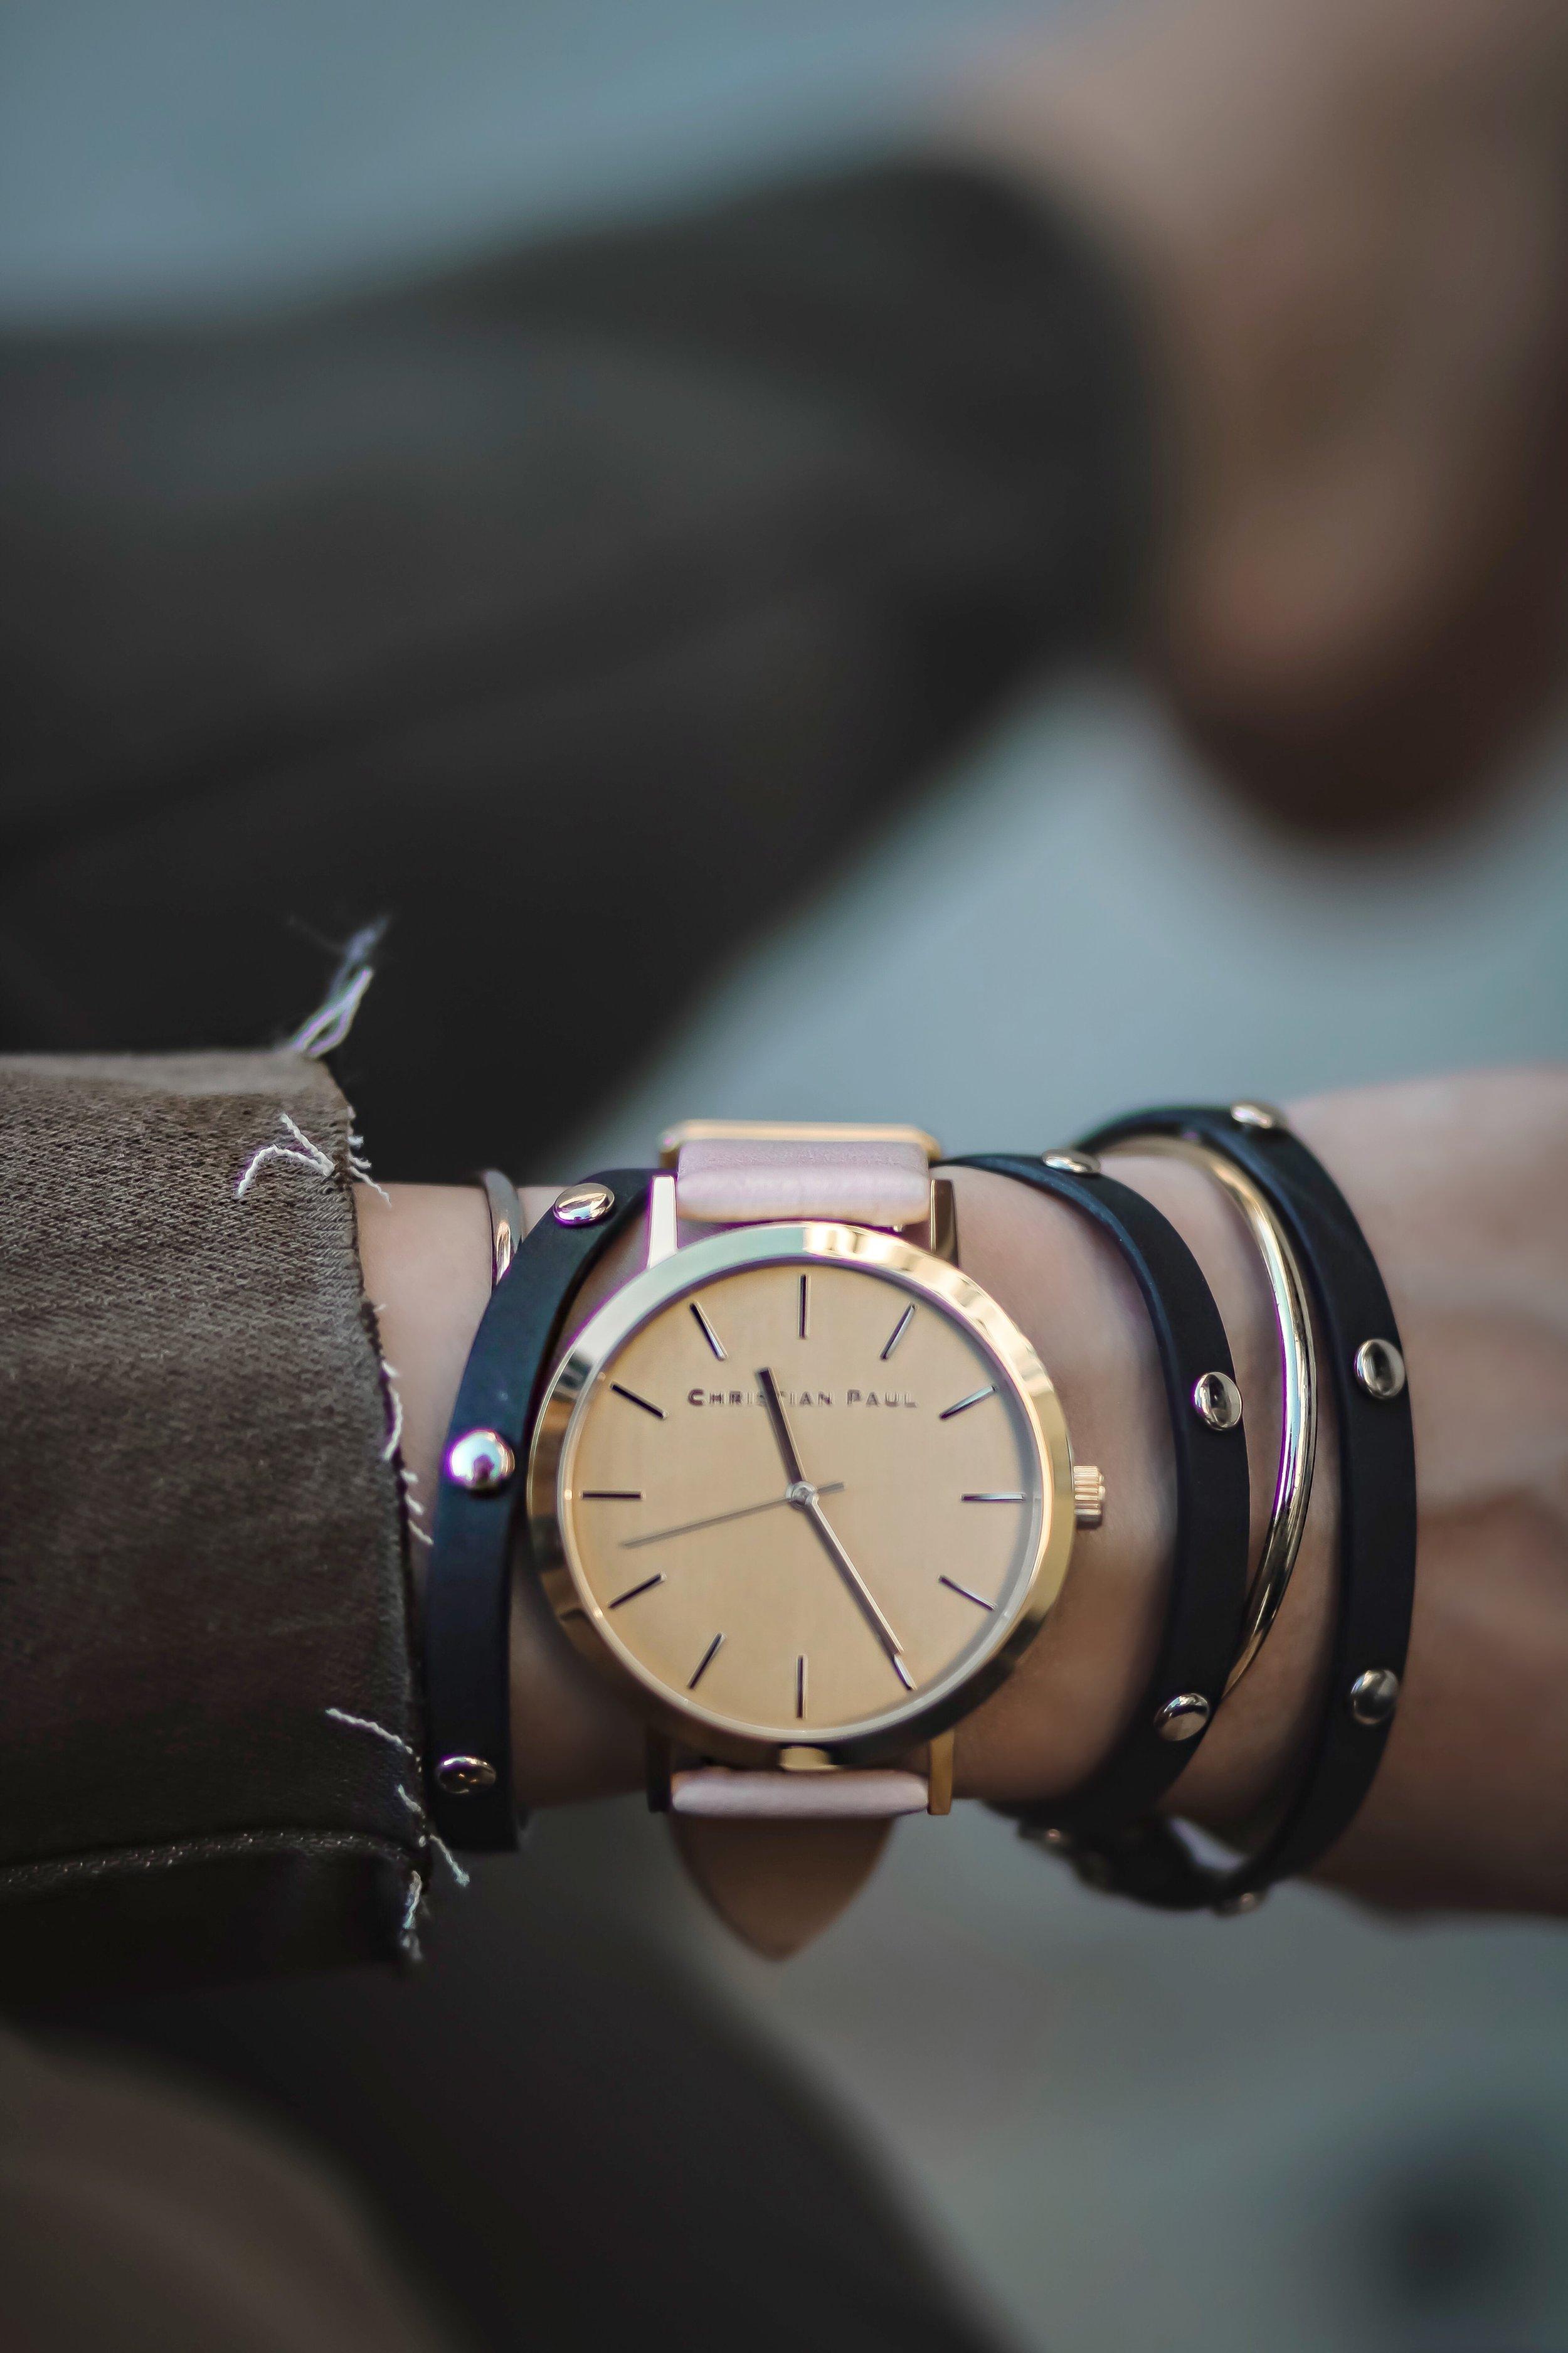 christian-paul-gold-watch-bloggerstyle